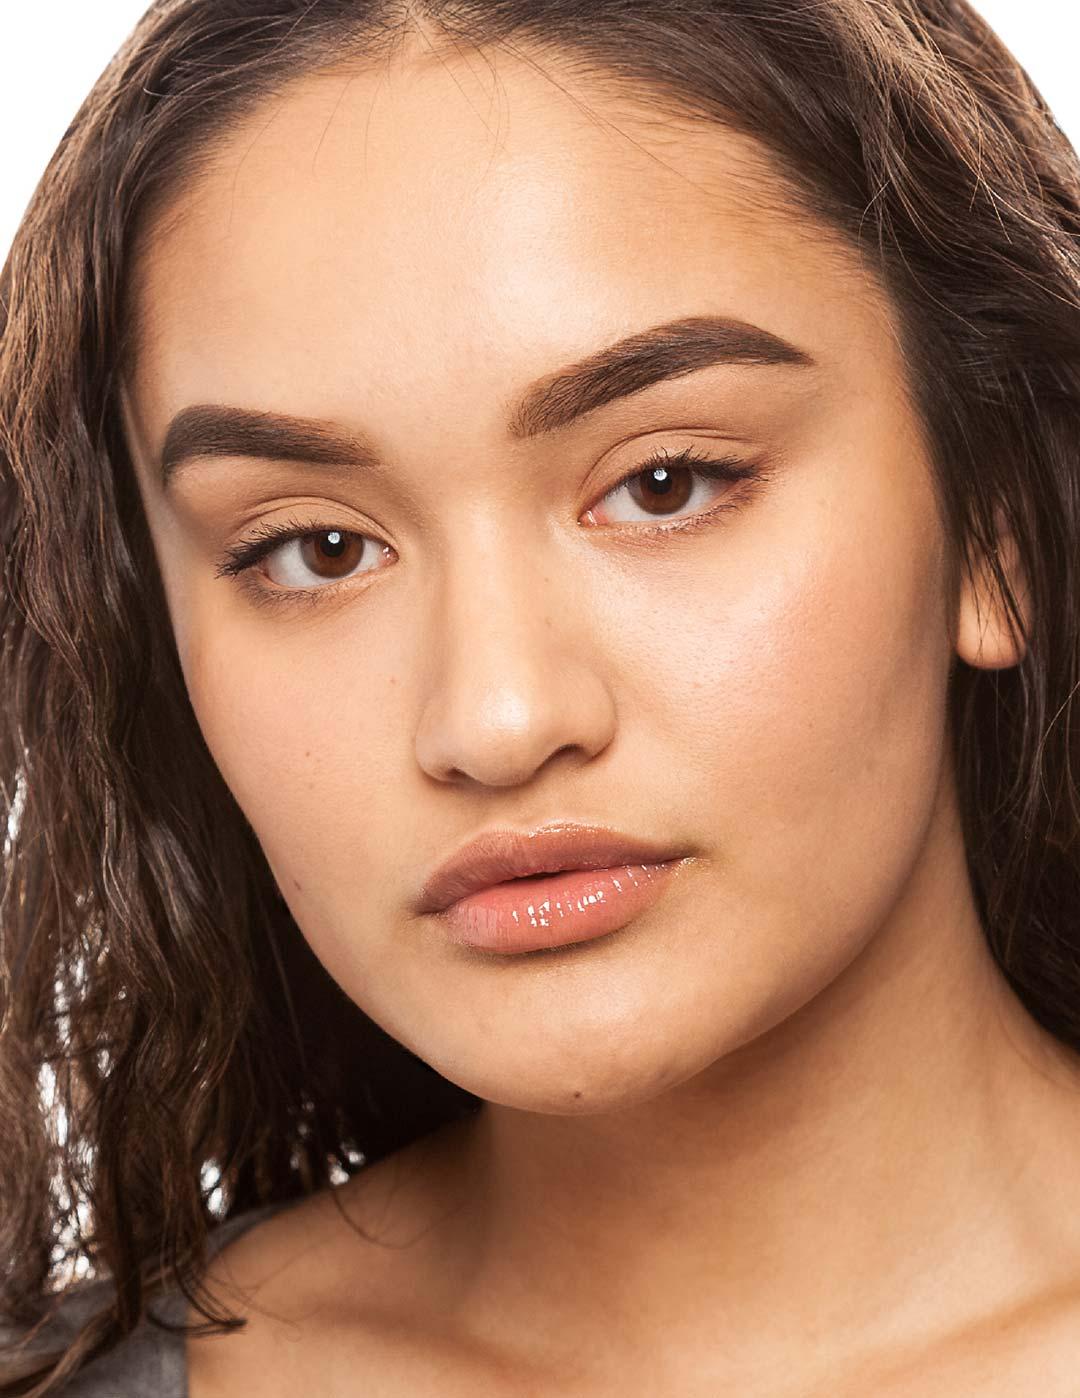 Kaira shot for Models & Images Wichita - model test shoot.